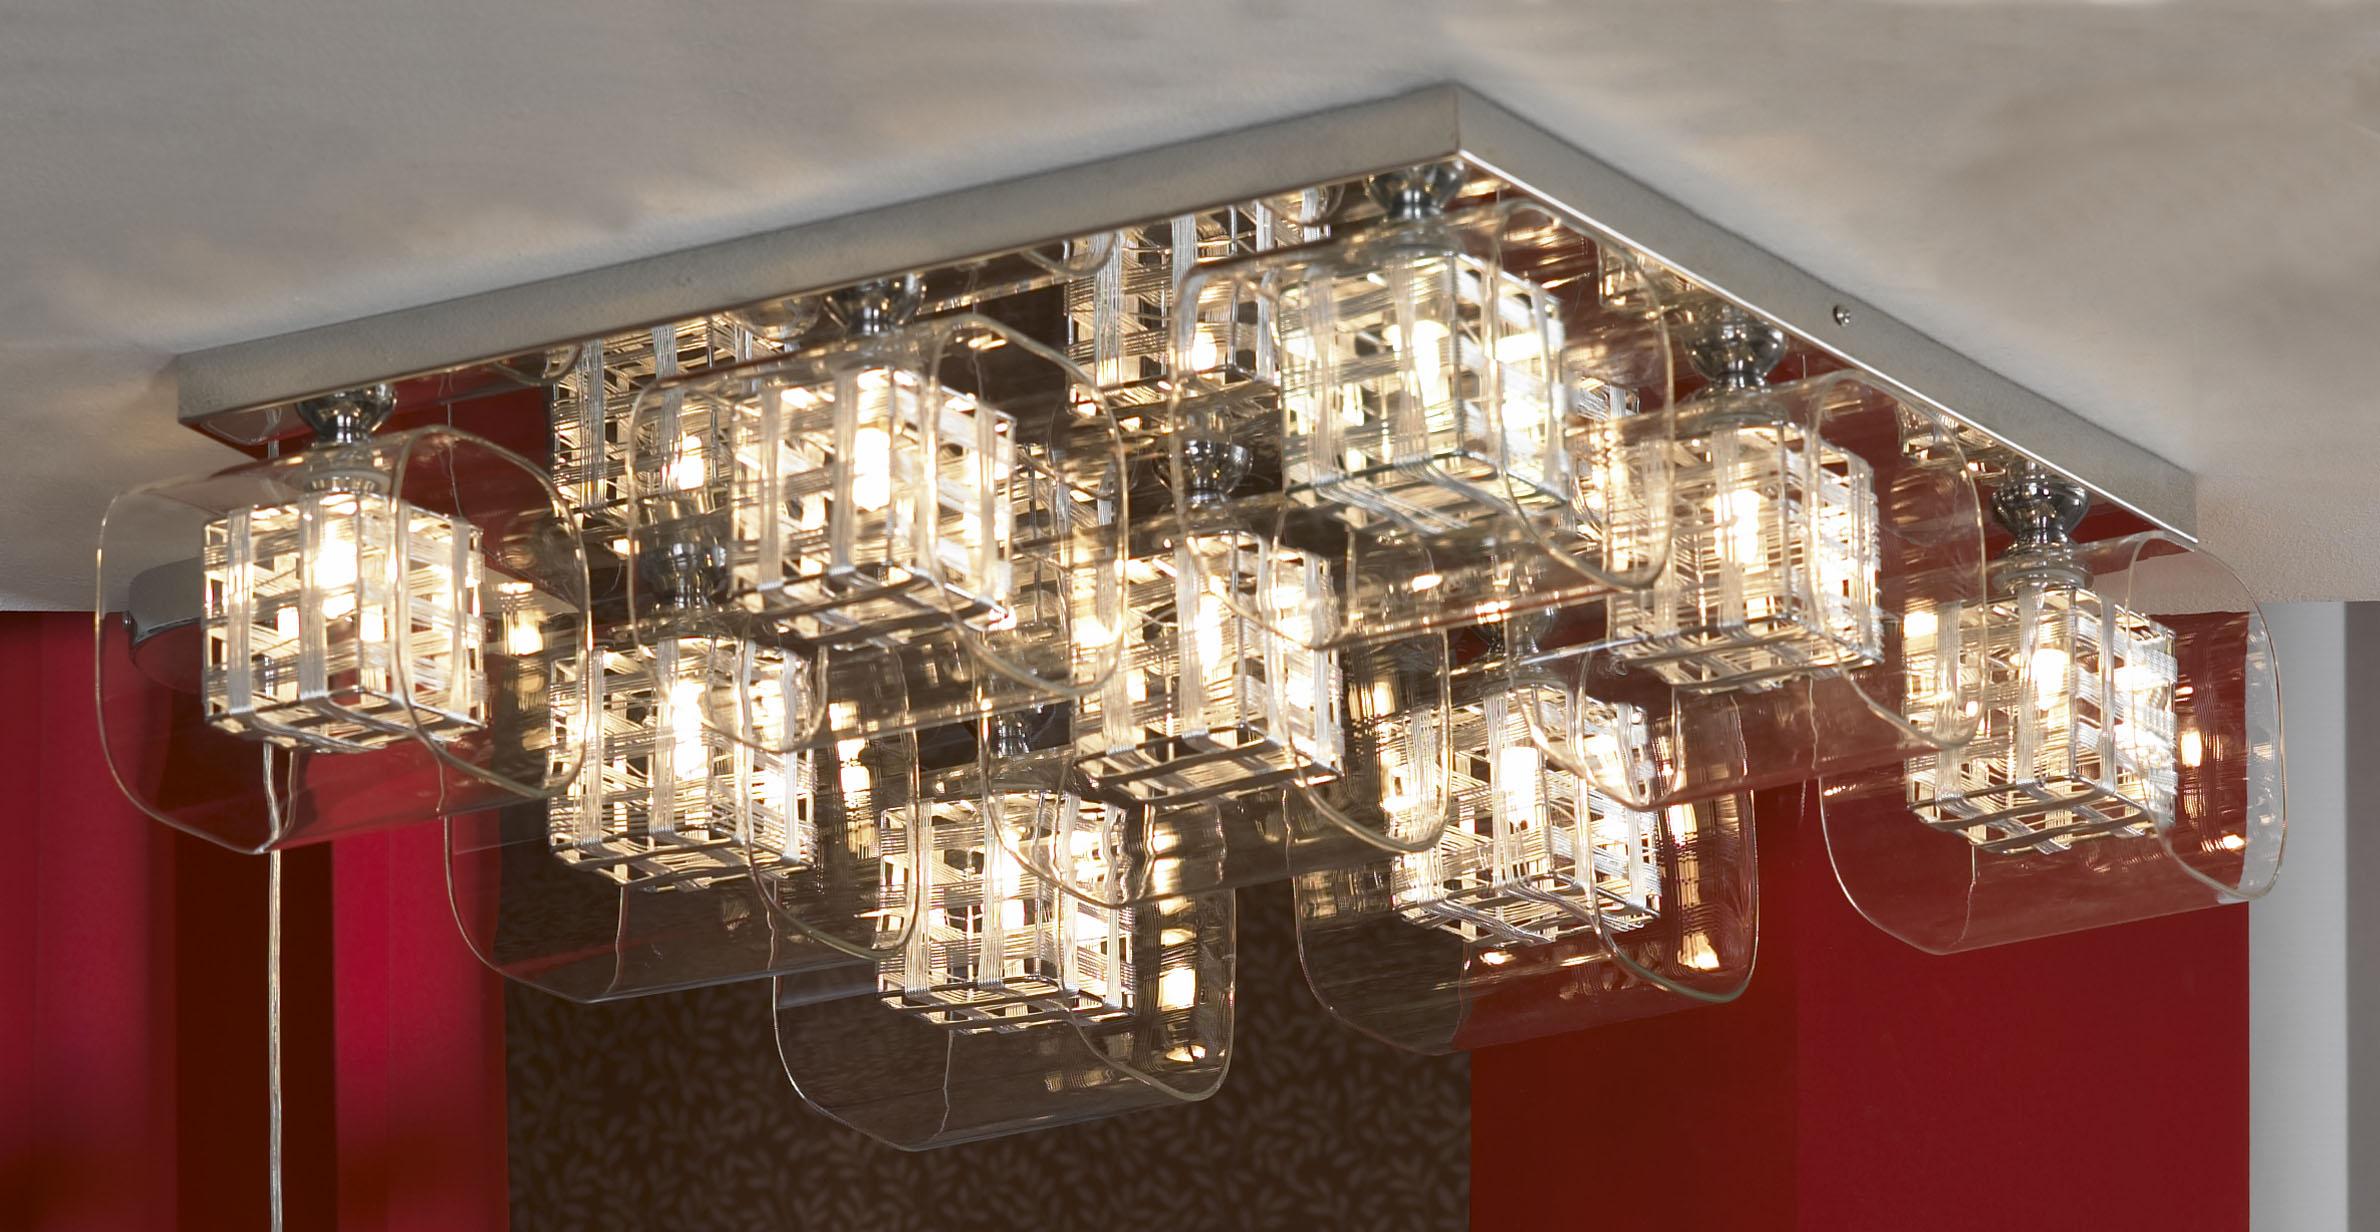 Люстра LussoleЛюстры<br>Назначение светильника: для гостиной,<br>Стиль светильника: модерн,<br>Тип: потолочная,<br>Материал светильника: металл, стекло,<br>Материал арматуры: металл,<br>Длина (мм): 160,<br>Ширина: 530,<br>Количество ламп: 9,<br>Тип лампы: галогенная,<br>Мощность: 40,<br>Патрон: G9,<br>Цвет арматуры: хром<br>